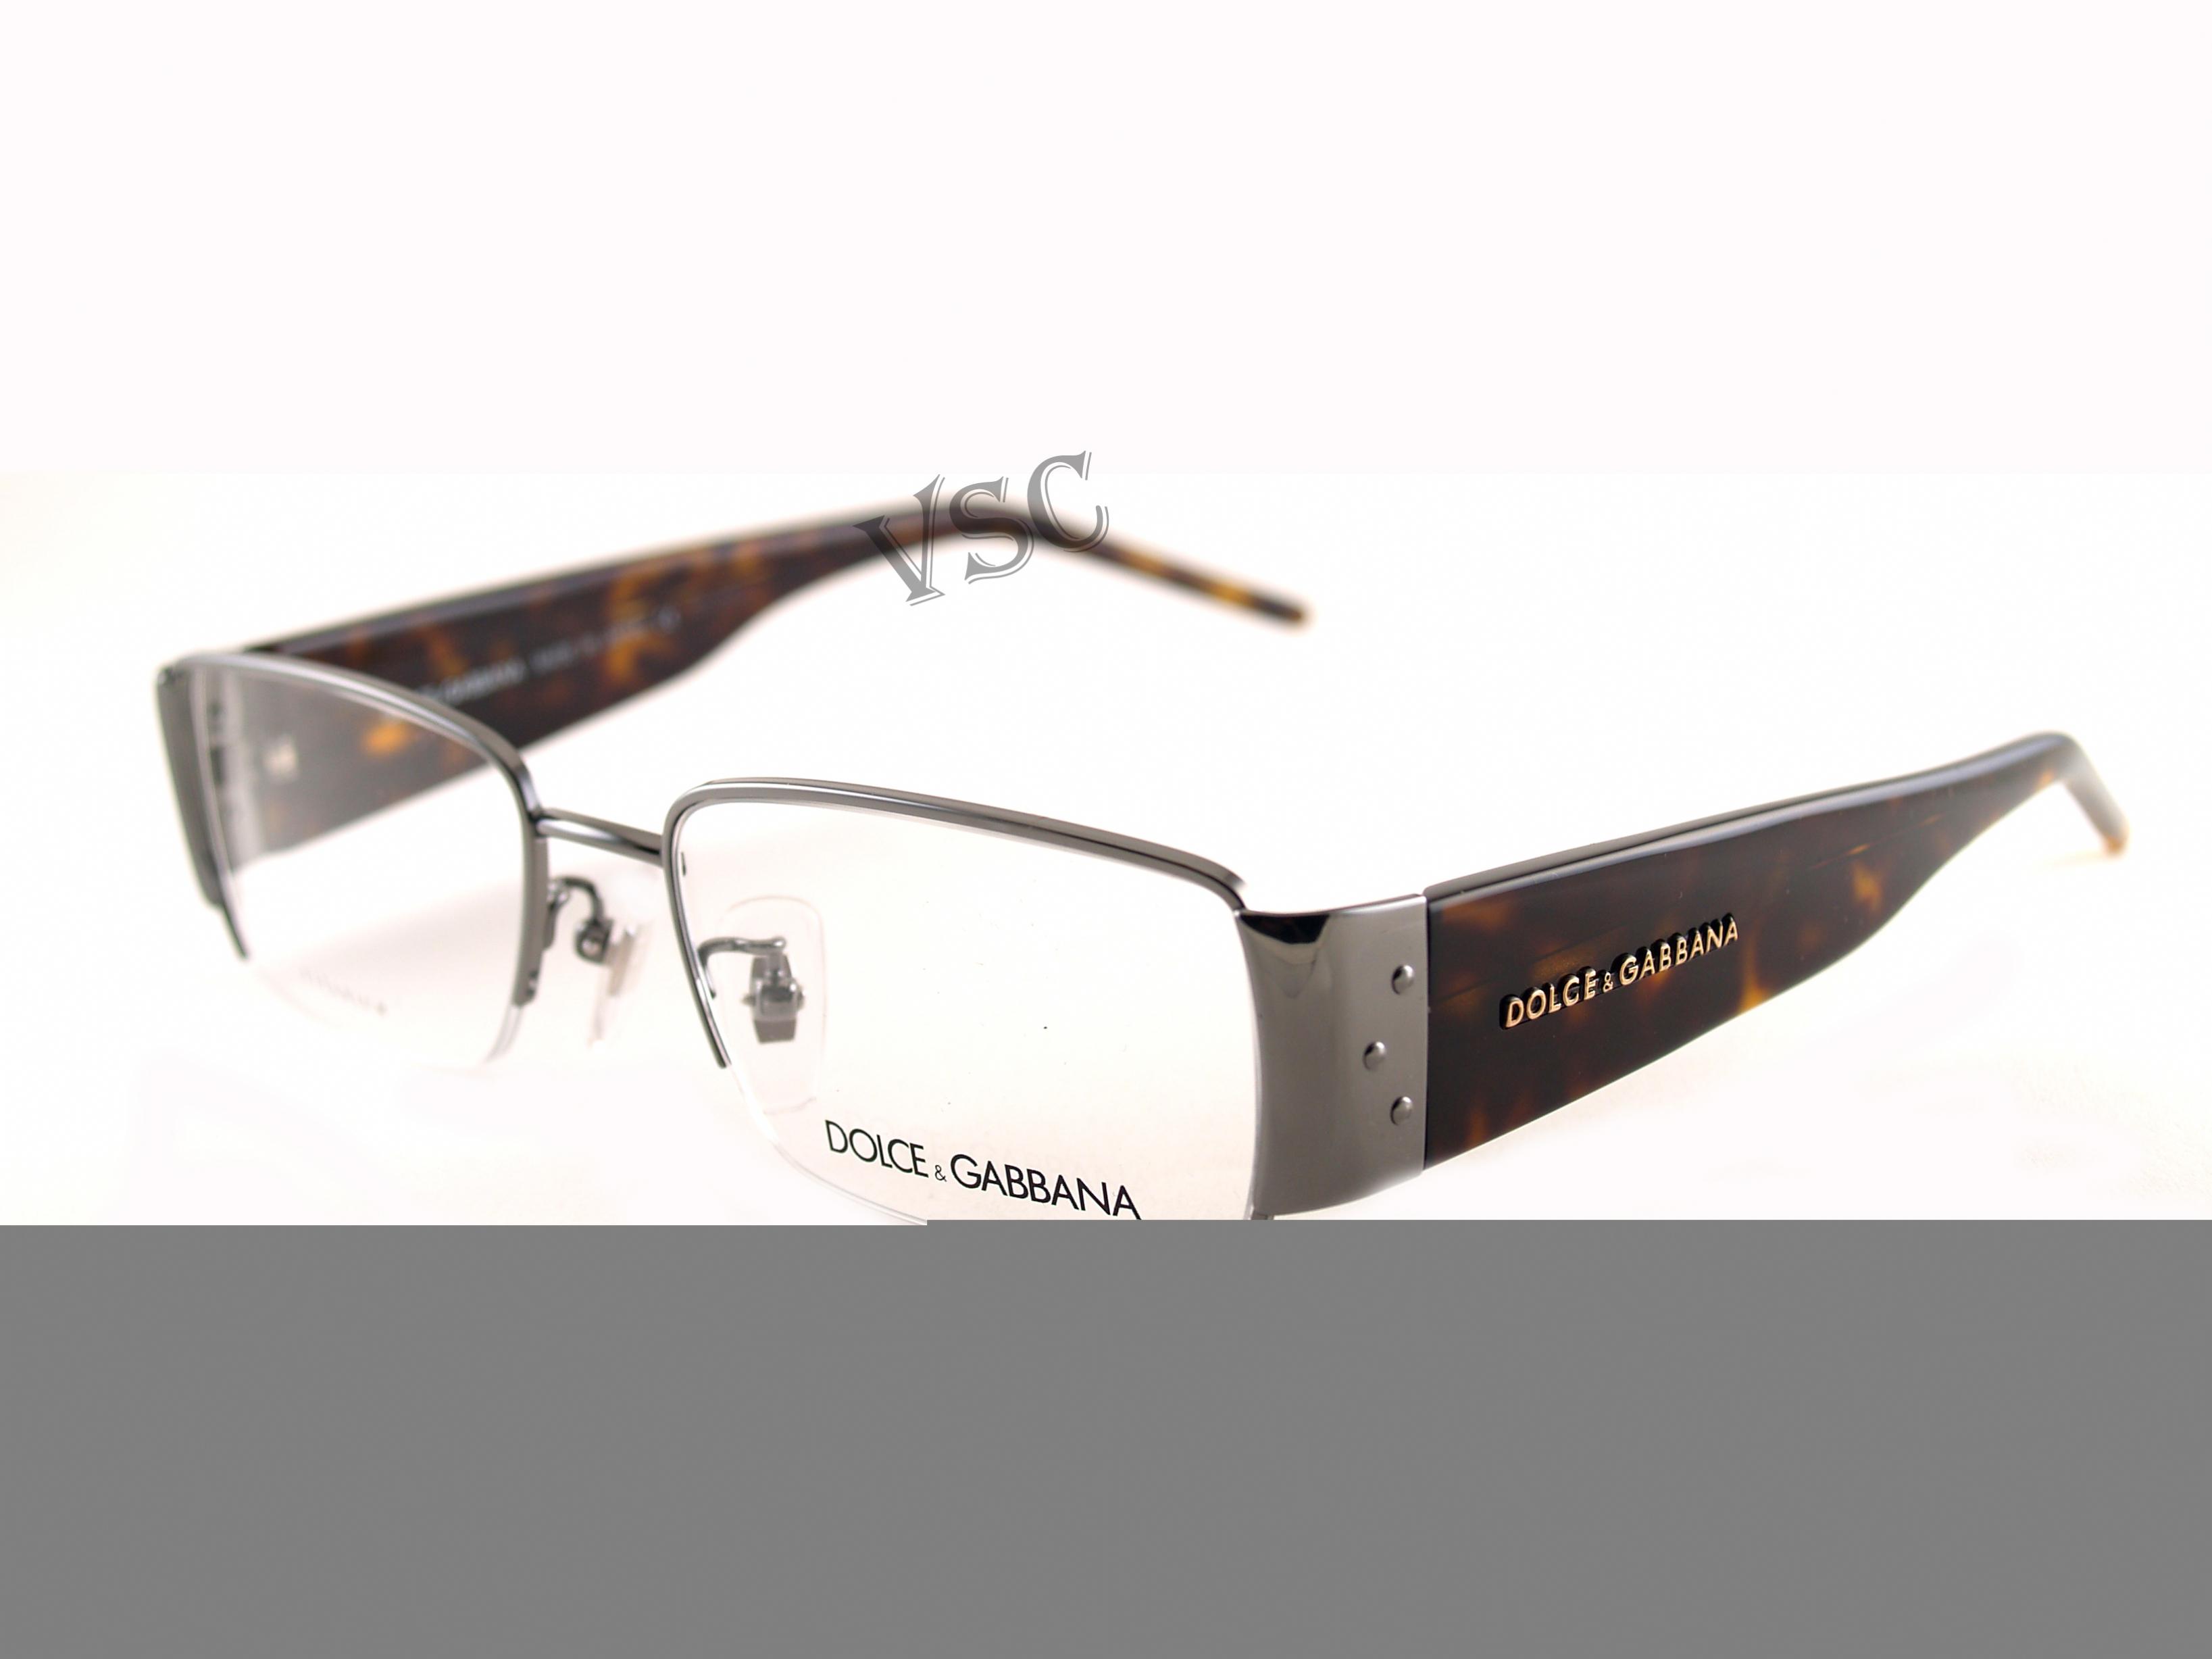 Eyeglass Frames Dolce Gabbana : Dolce Gabbana 1138t Eyeglasses